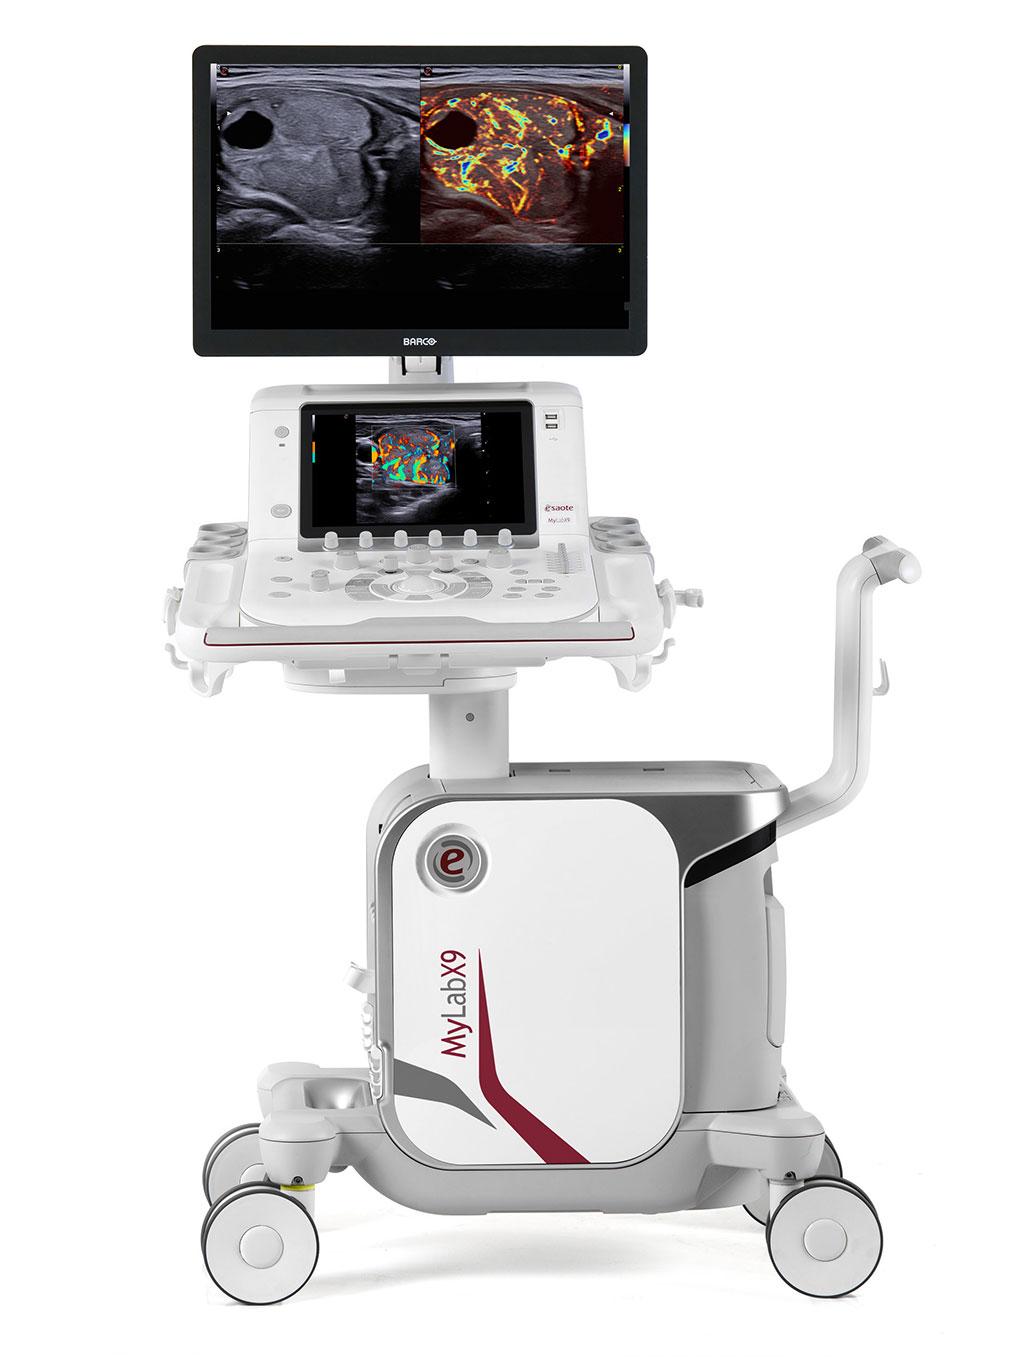 Image: The MyLab X9 64-bit X ULTRA ultrasound system (Photo courtesy of Esaote)